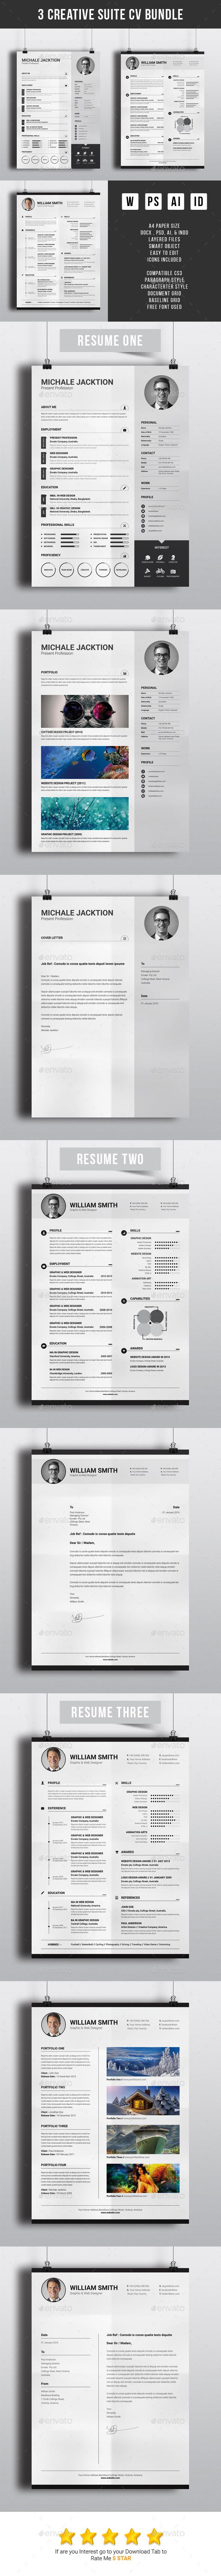 Creative Suite CV Bundle Templates PSD, Vector EPS, InDesign INDD, AI Illustrator, MS Word. Download here: https://graphicriver.net/item/creative-suite-cv-bundle/17244382?ref=ksioks